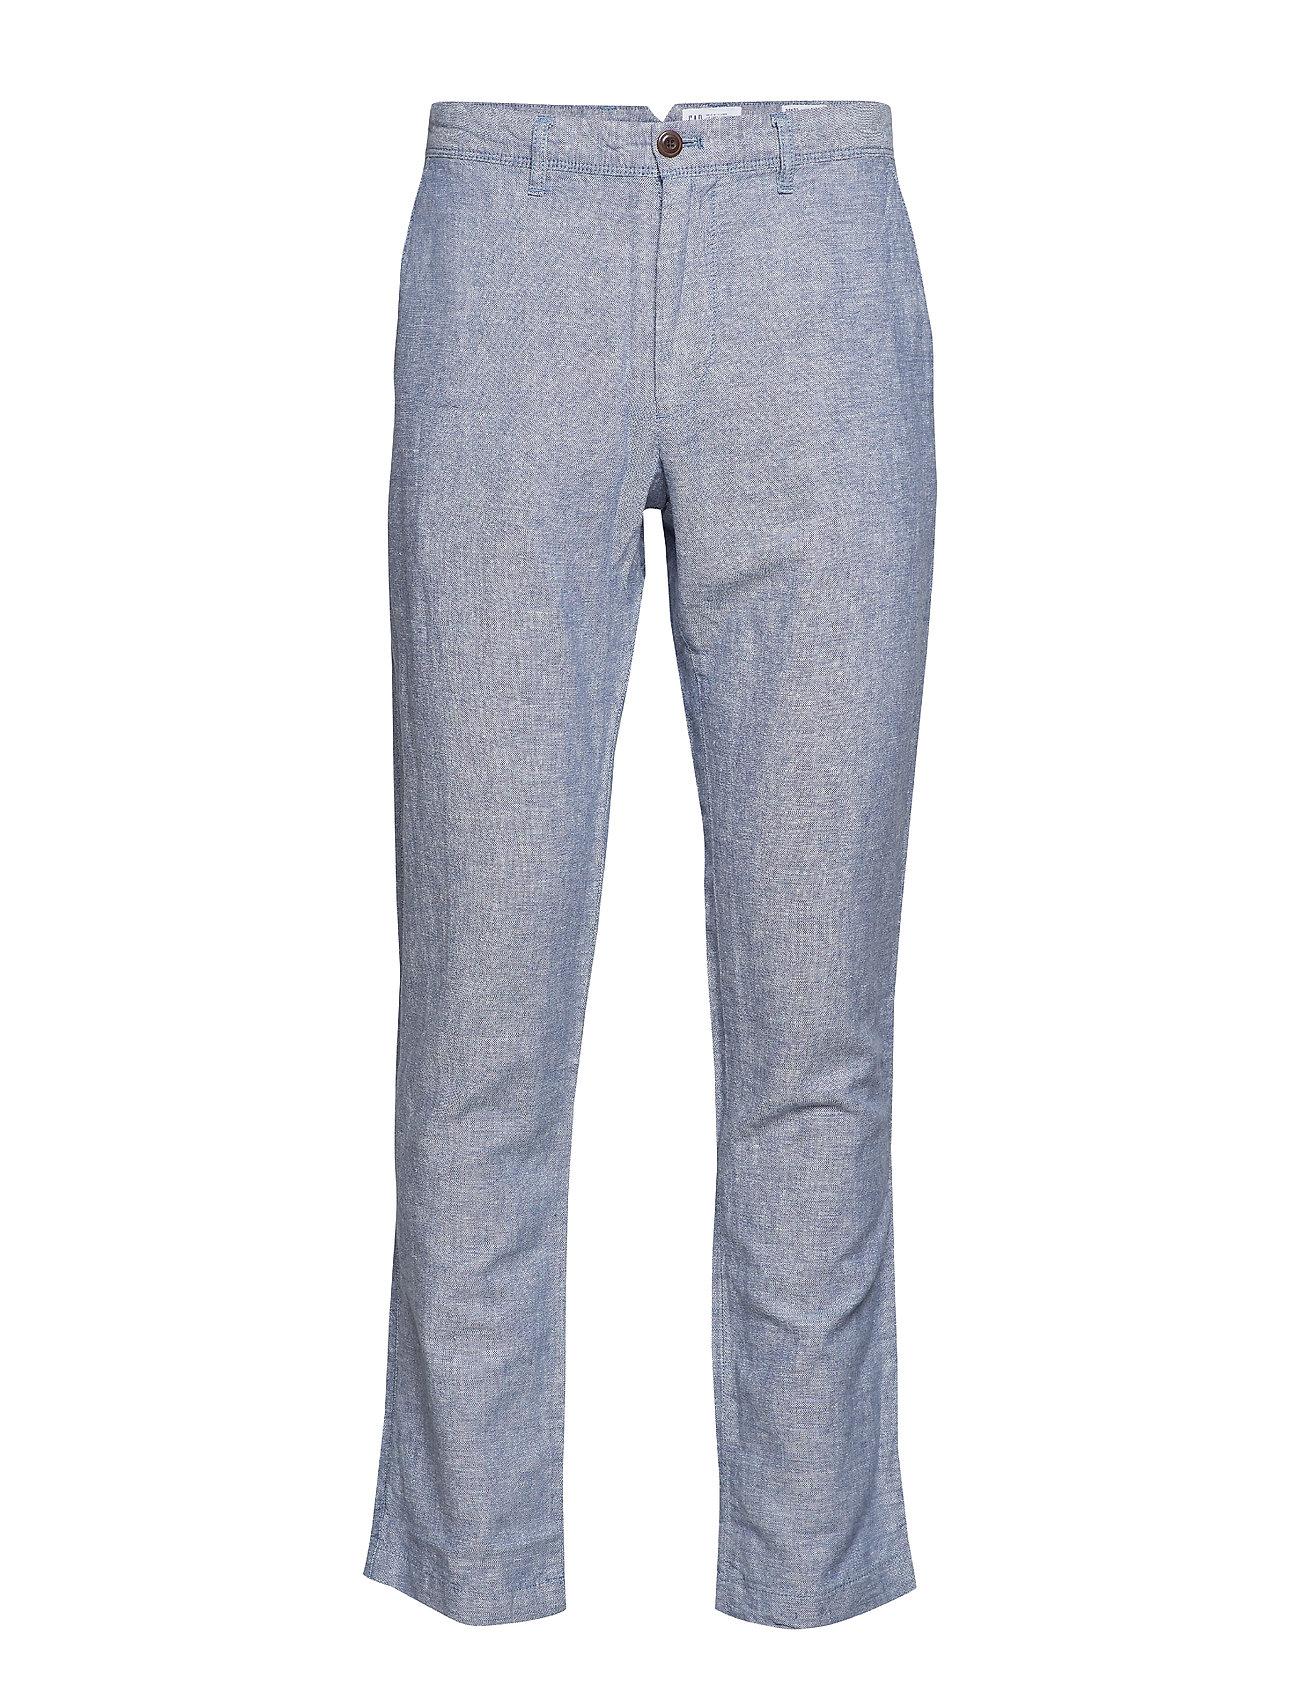 GAP Linen Khakis in Slim Fit - CHAMBRAY 042